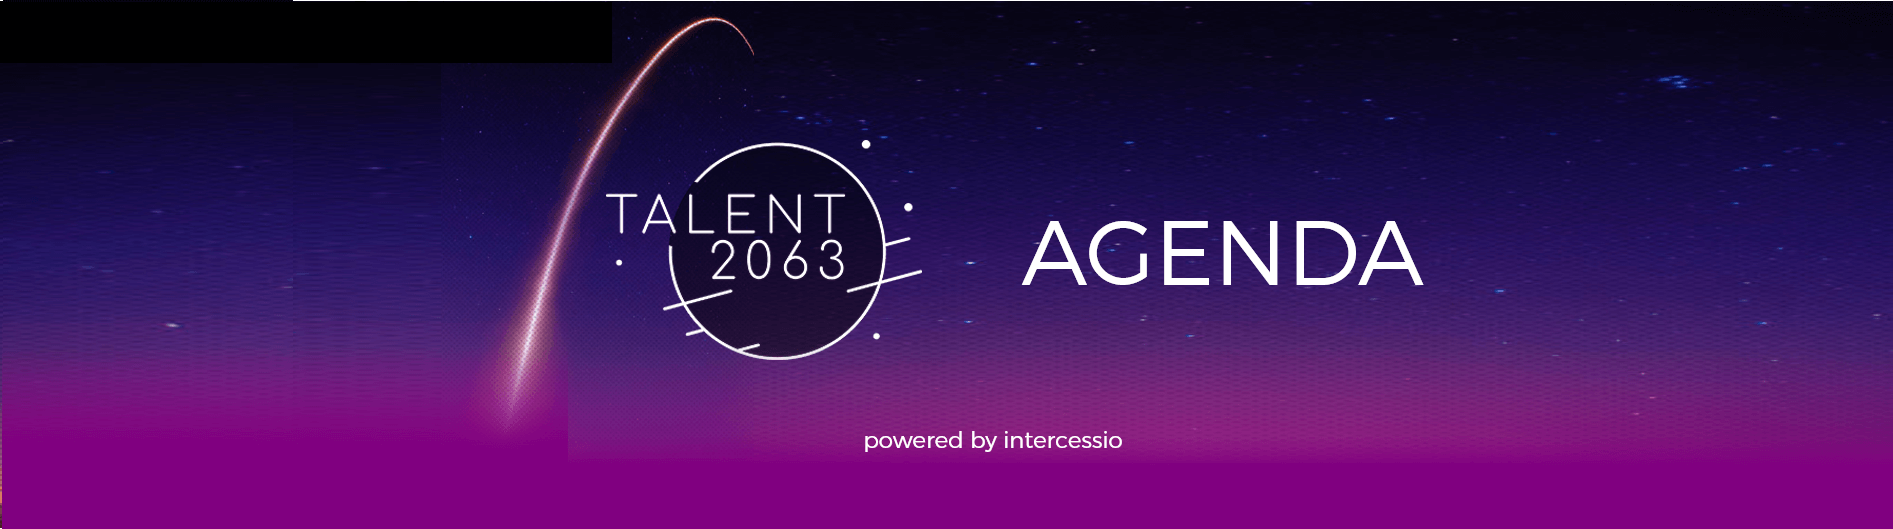 Talent 2063 - Agenda powered by Intercessio